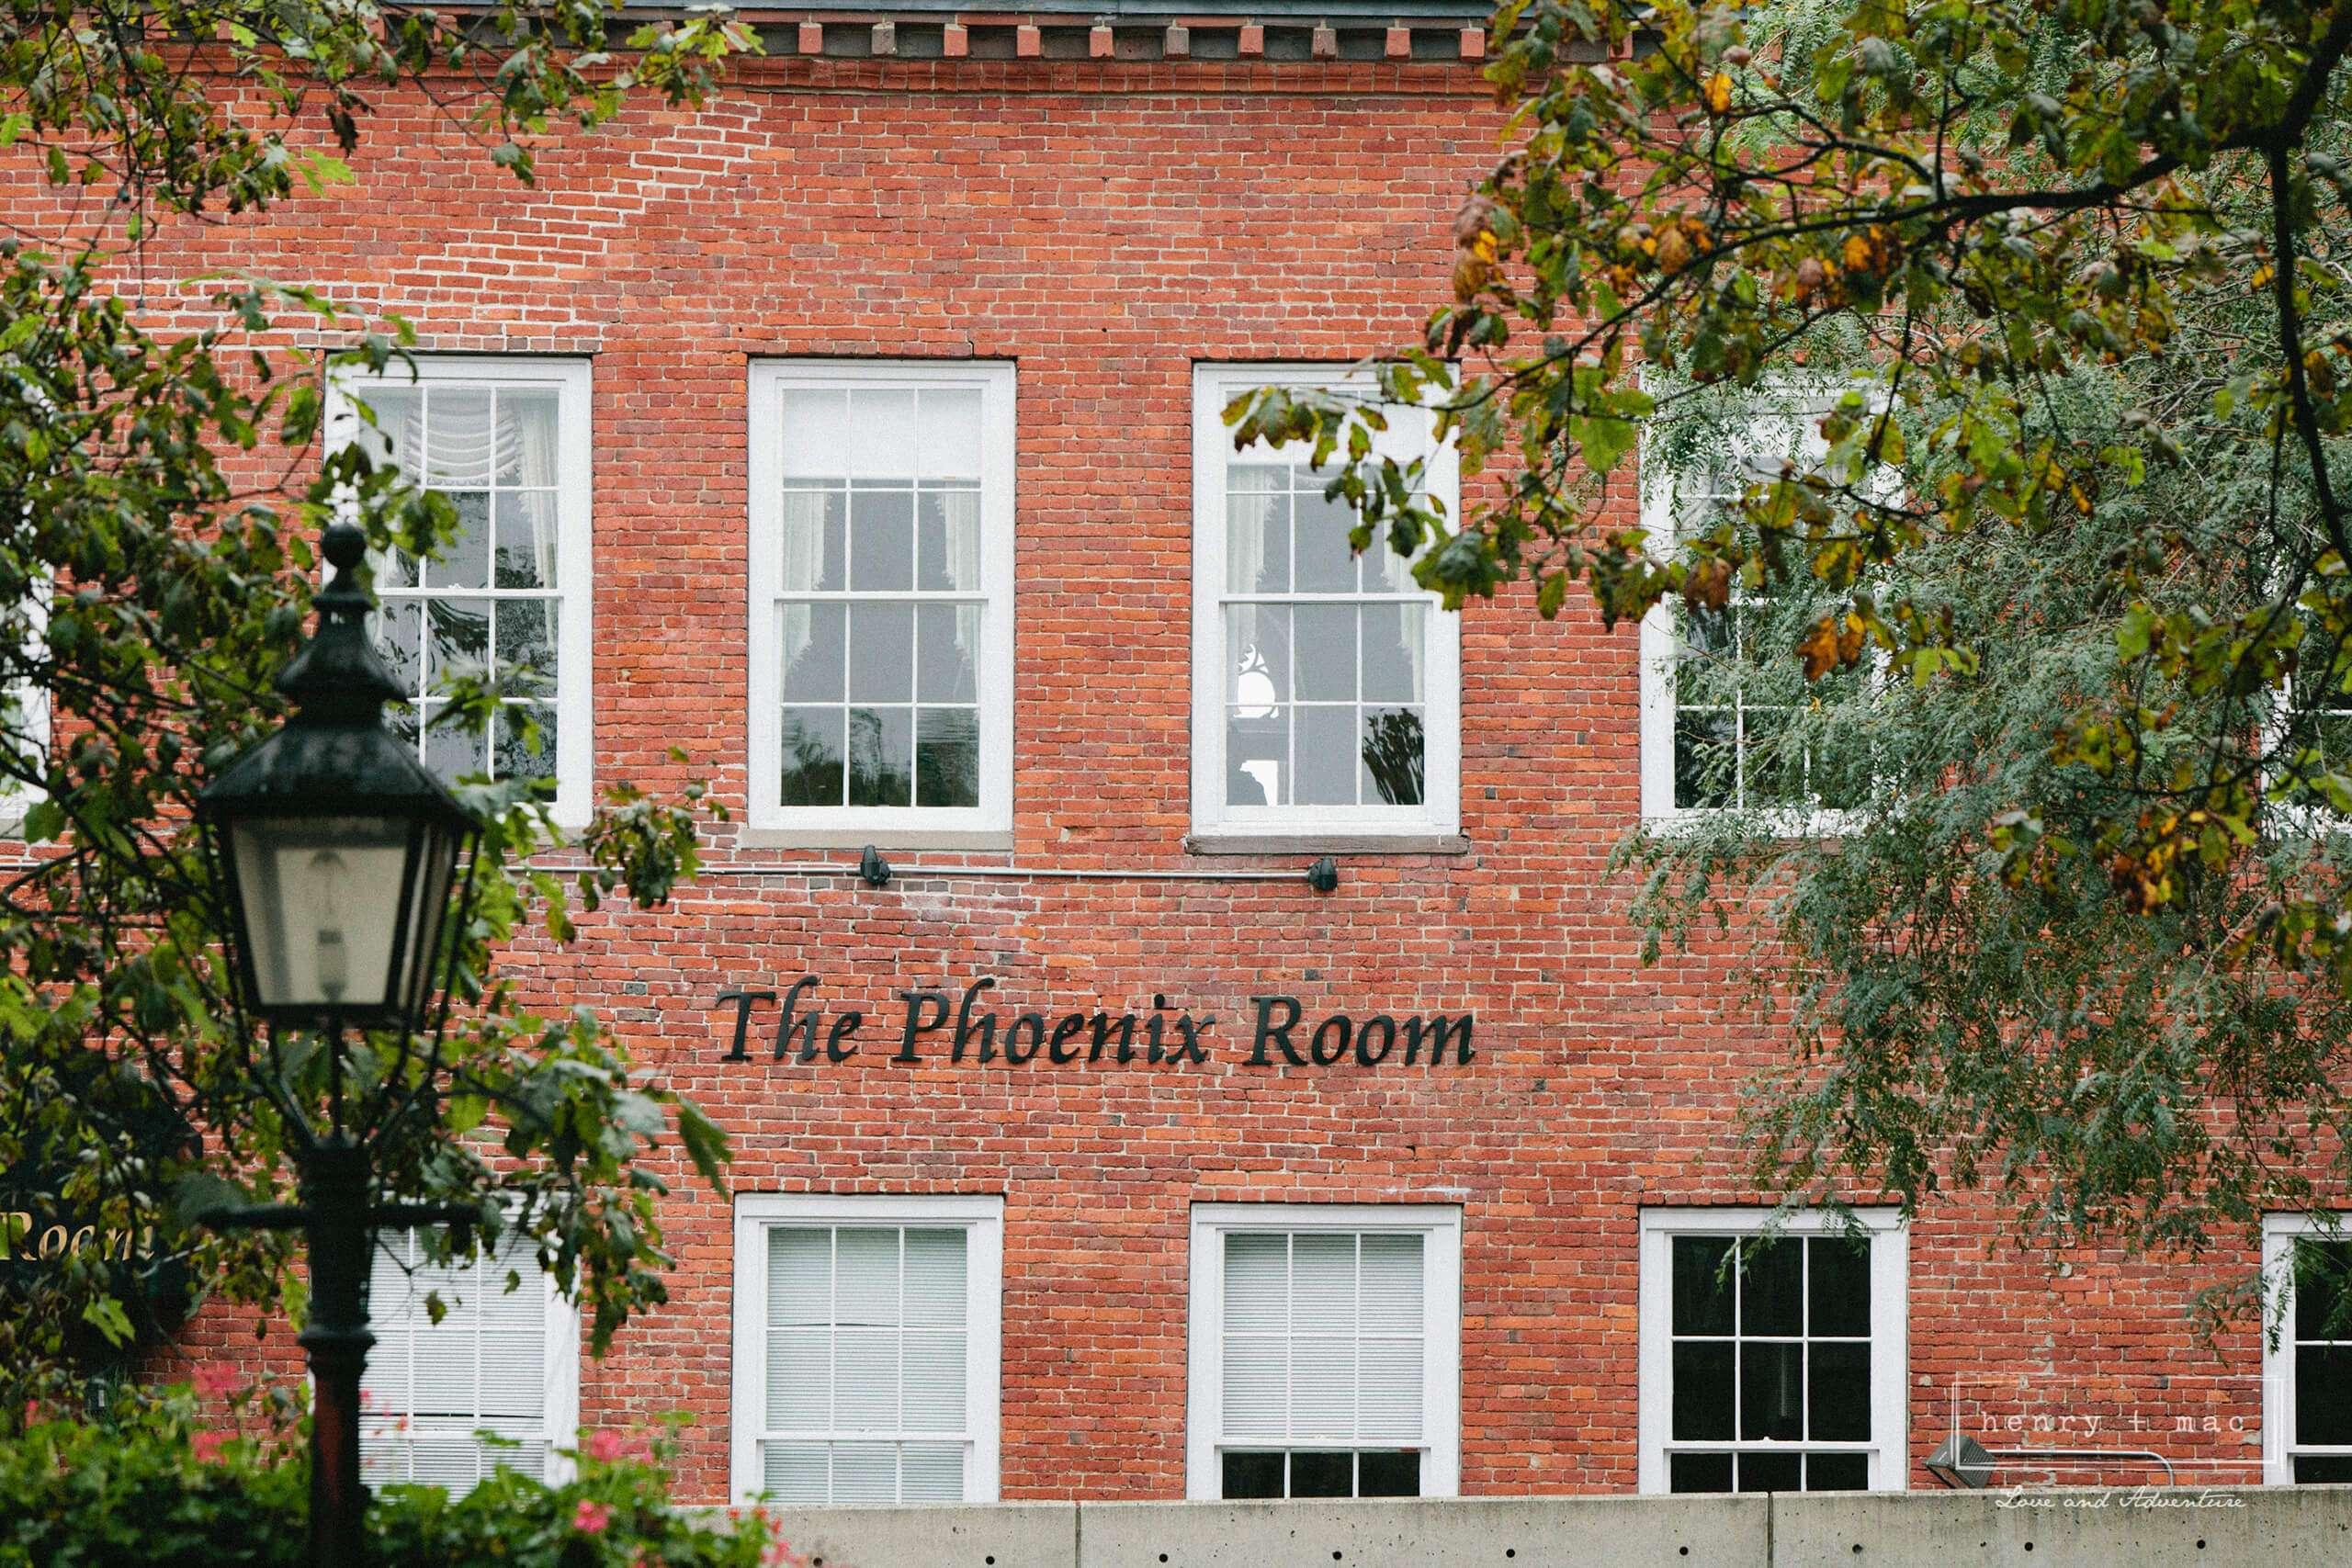 Phoenix Room exterior signs